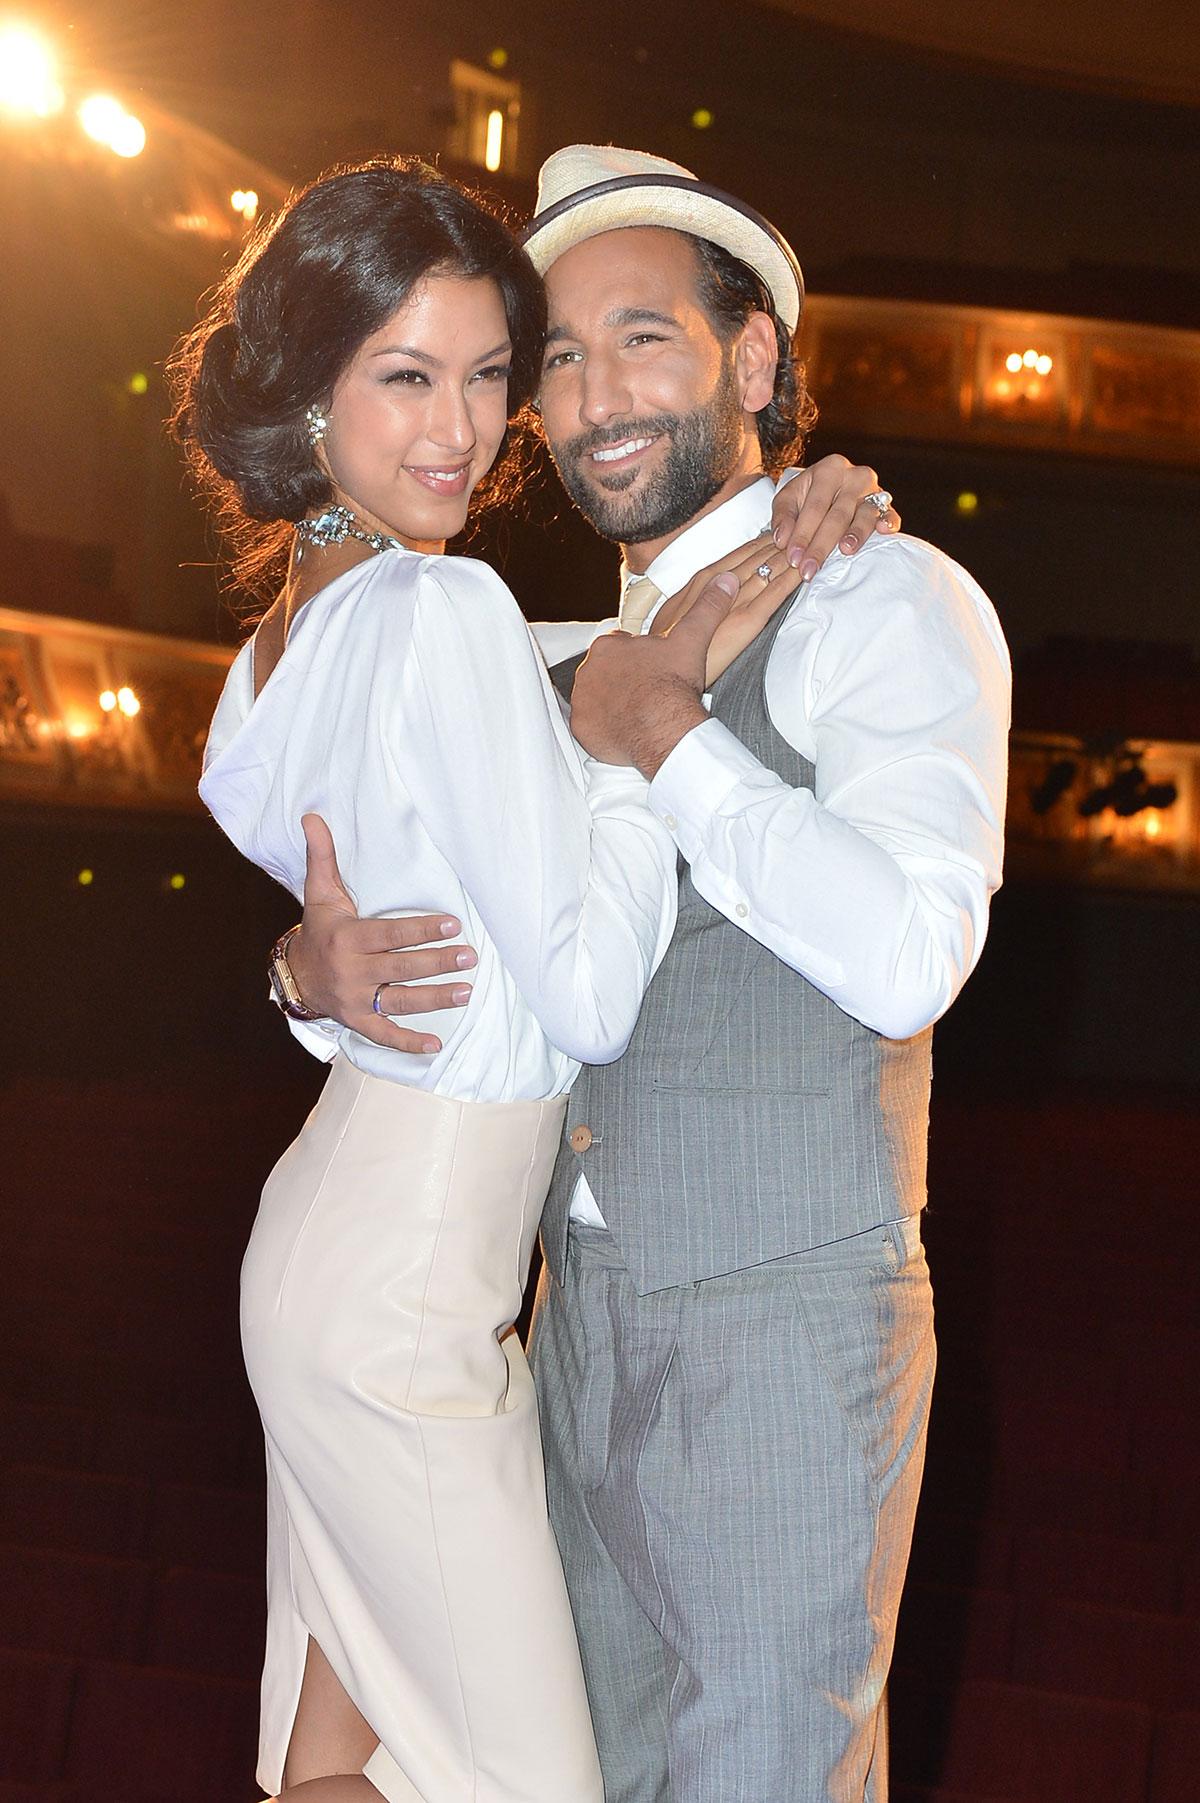 Rebecca Mir attends Dirty Dancing Das Orginal premiere live